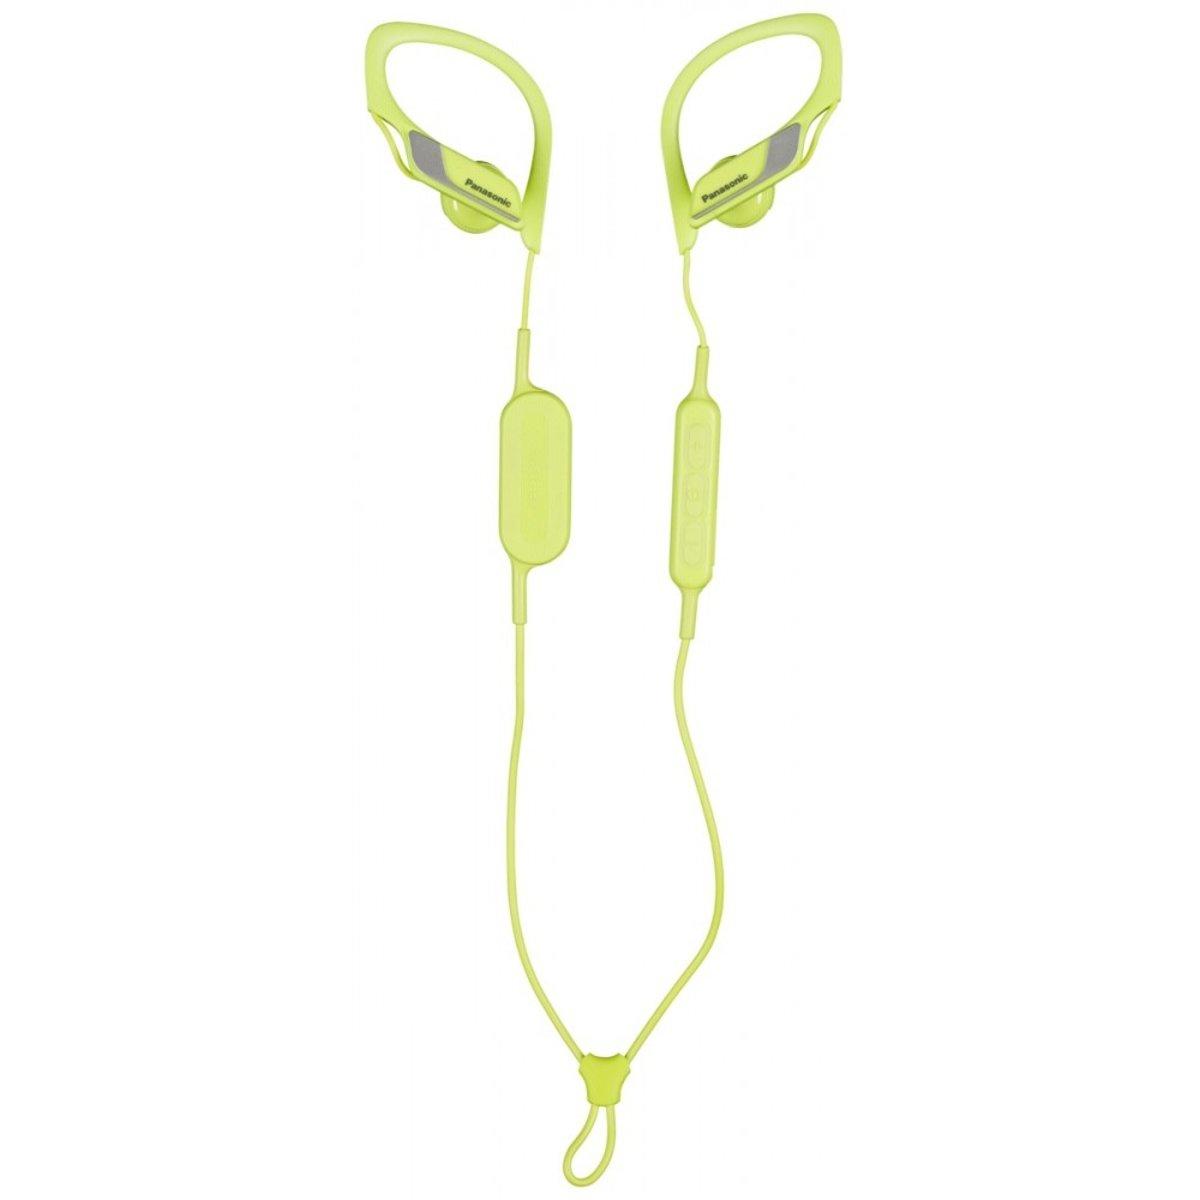 Panasonic RP-BTS10 mobiele hoofdtelefoon Stereofonisch In-ear Groen Draadloos kopen